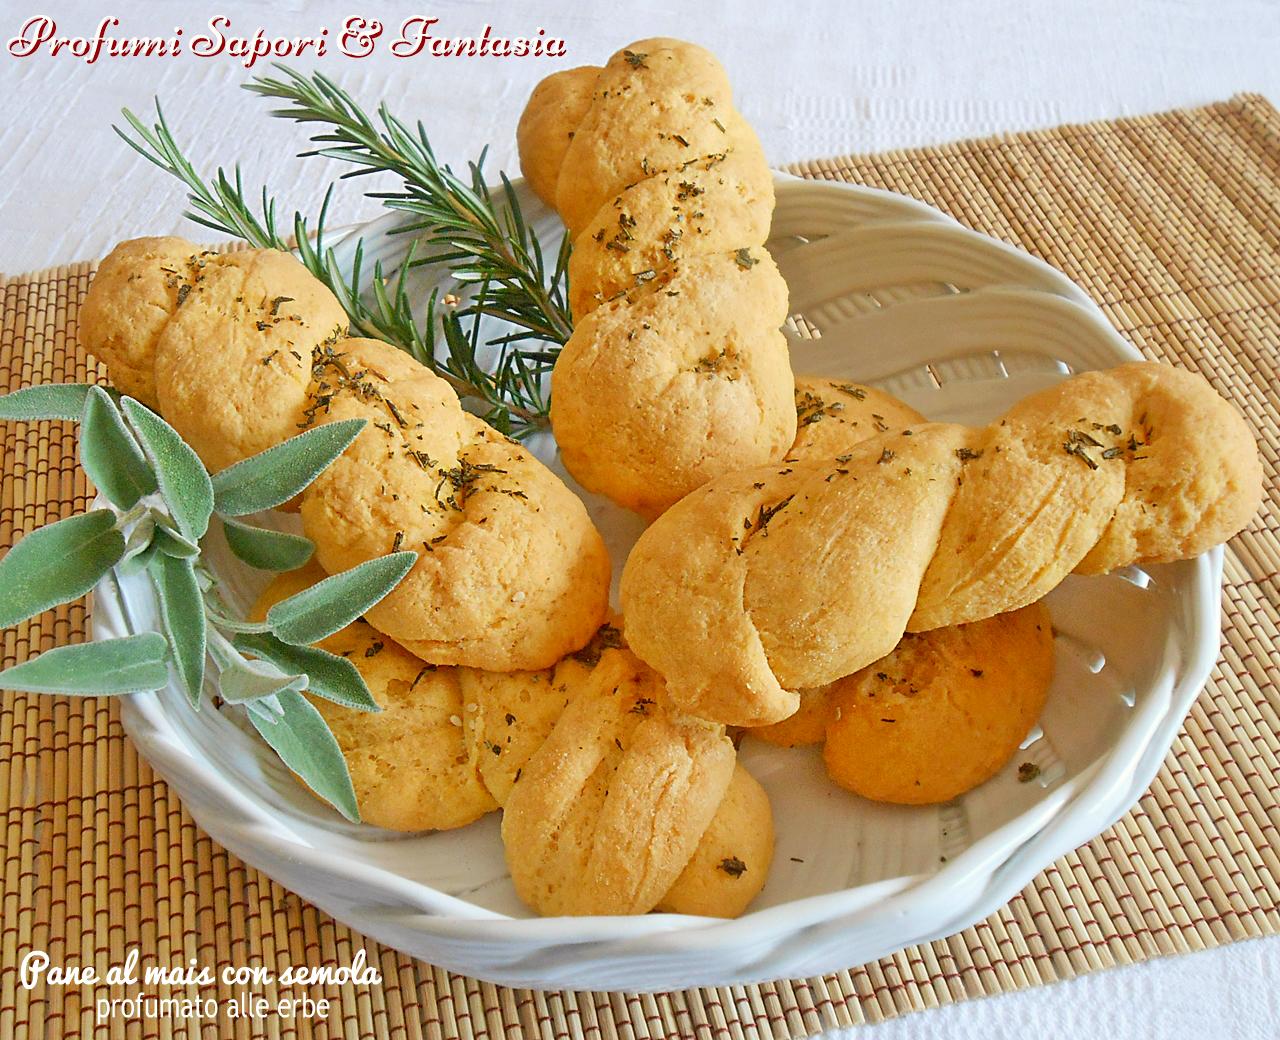 Pane al mais con semola